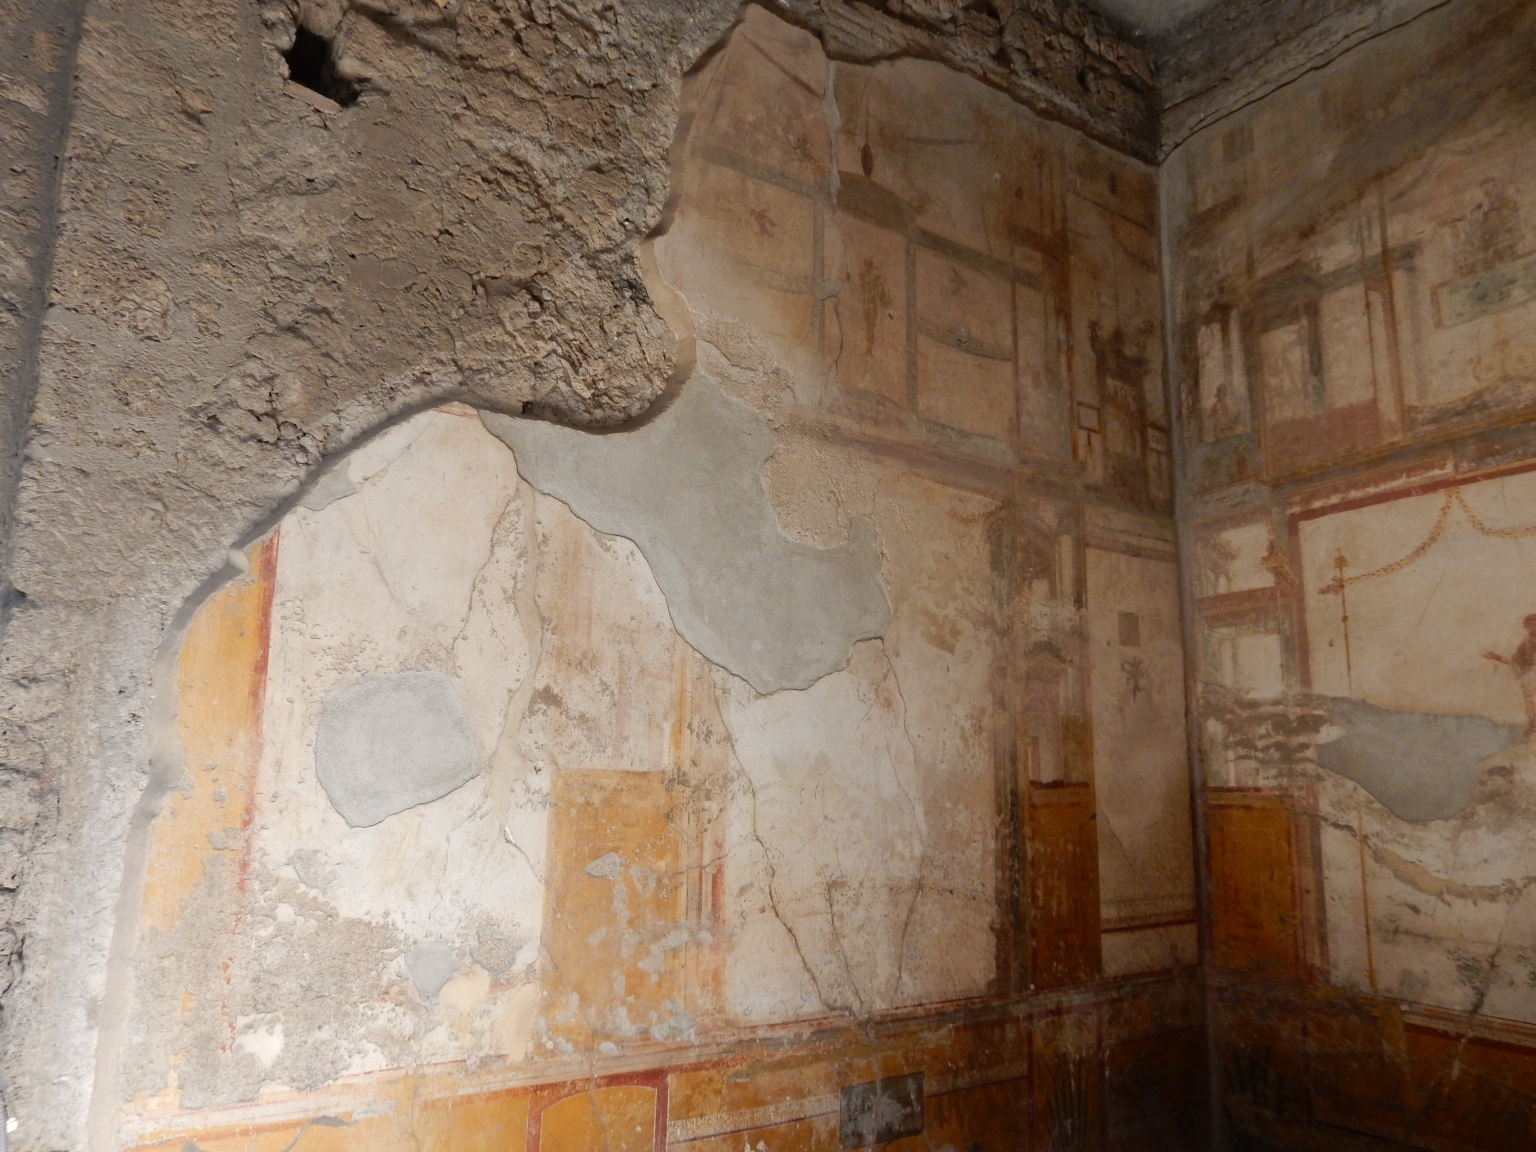 VI.8.23 Pompeii. May 2017. West wall of north ala. Photo courtesy of Buzz Ferebee.